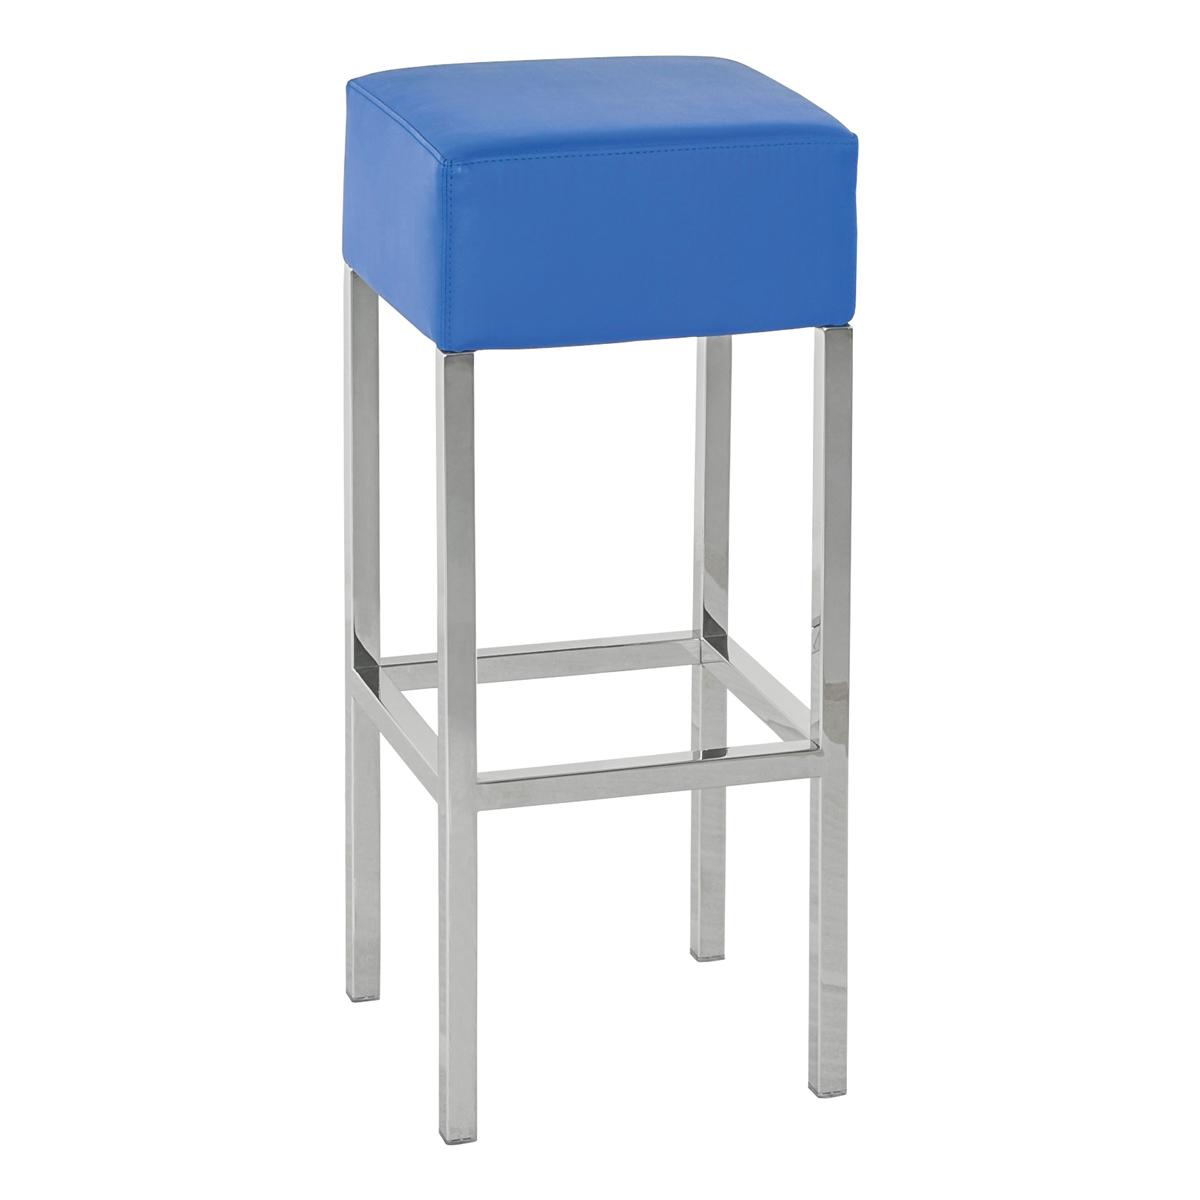 cube blau dlse mietm bel. Black Bedroom Furniture Sets. Home Design Ideas